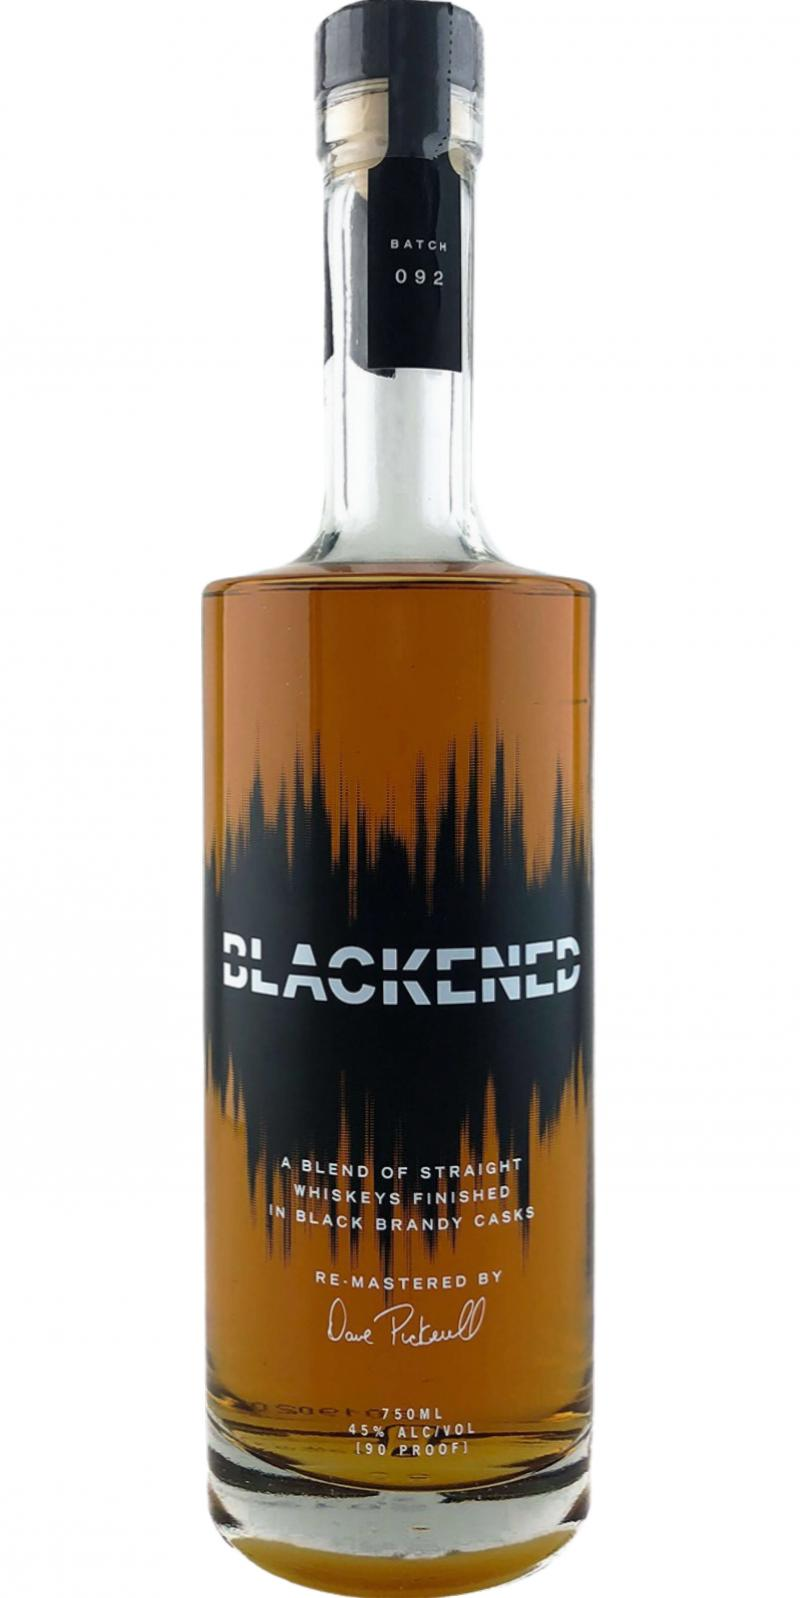 Blackened Batch 092